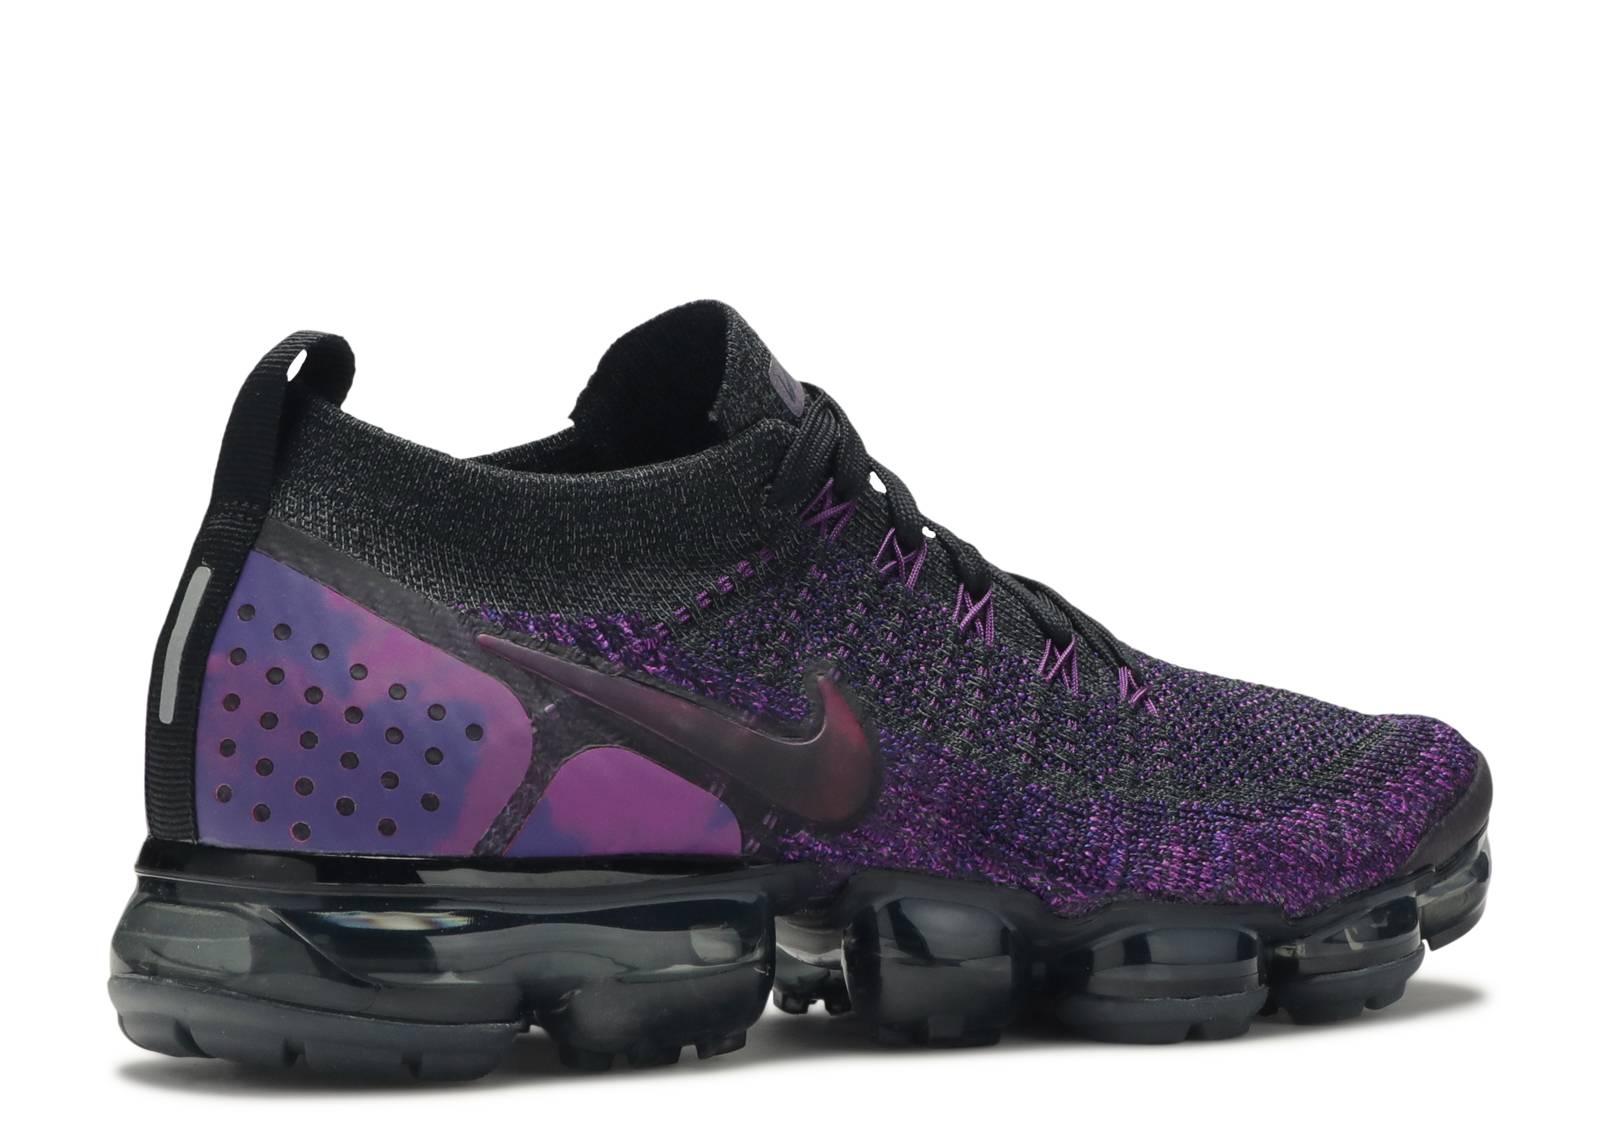 027c68abdfac Nike Vapormax Flyknit 2.0